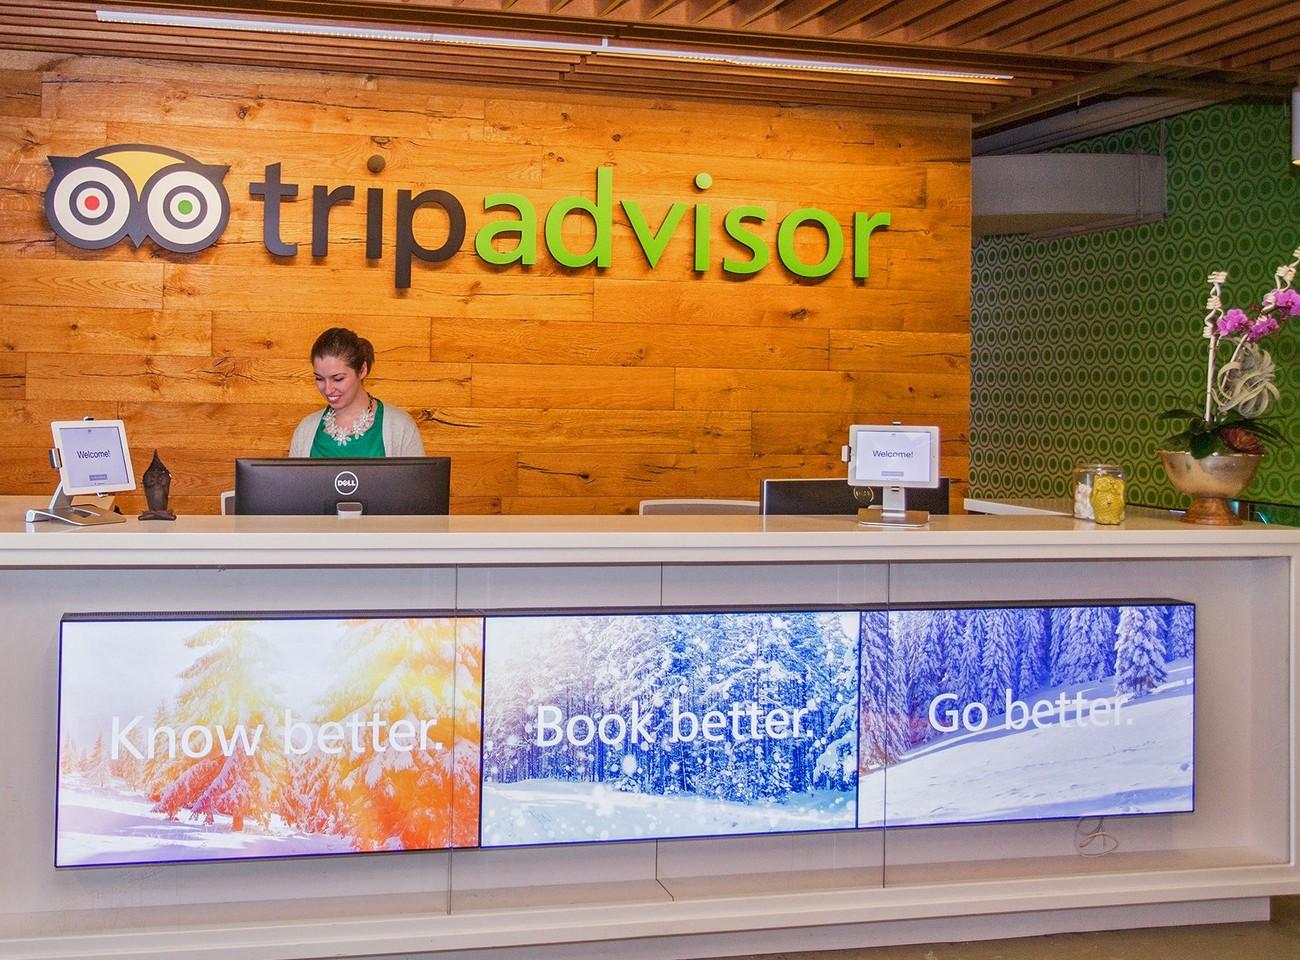 TripAdvisor Careers